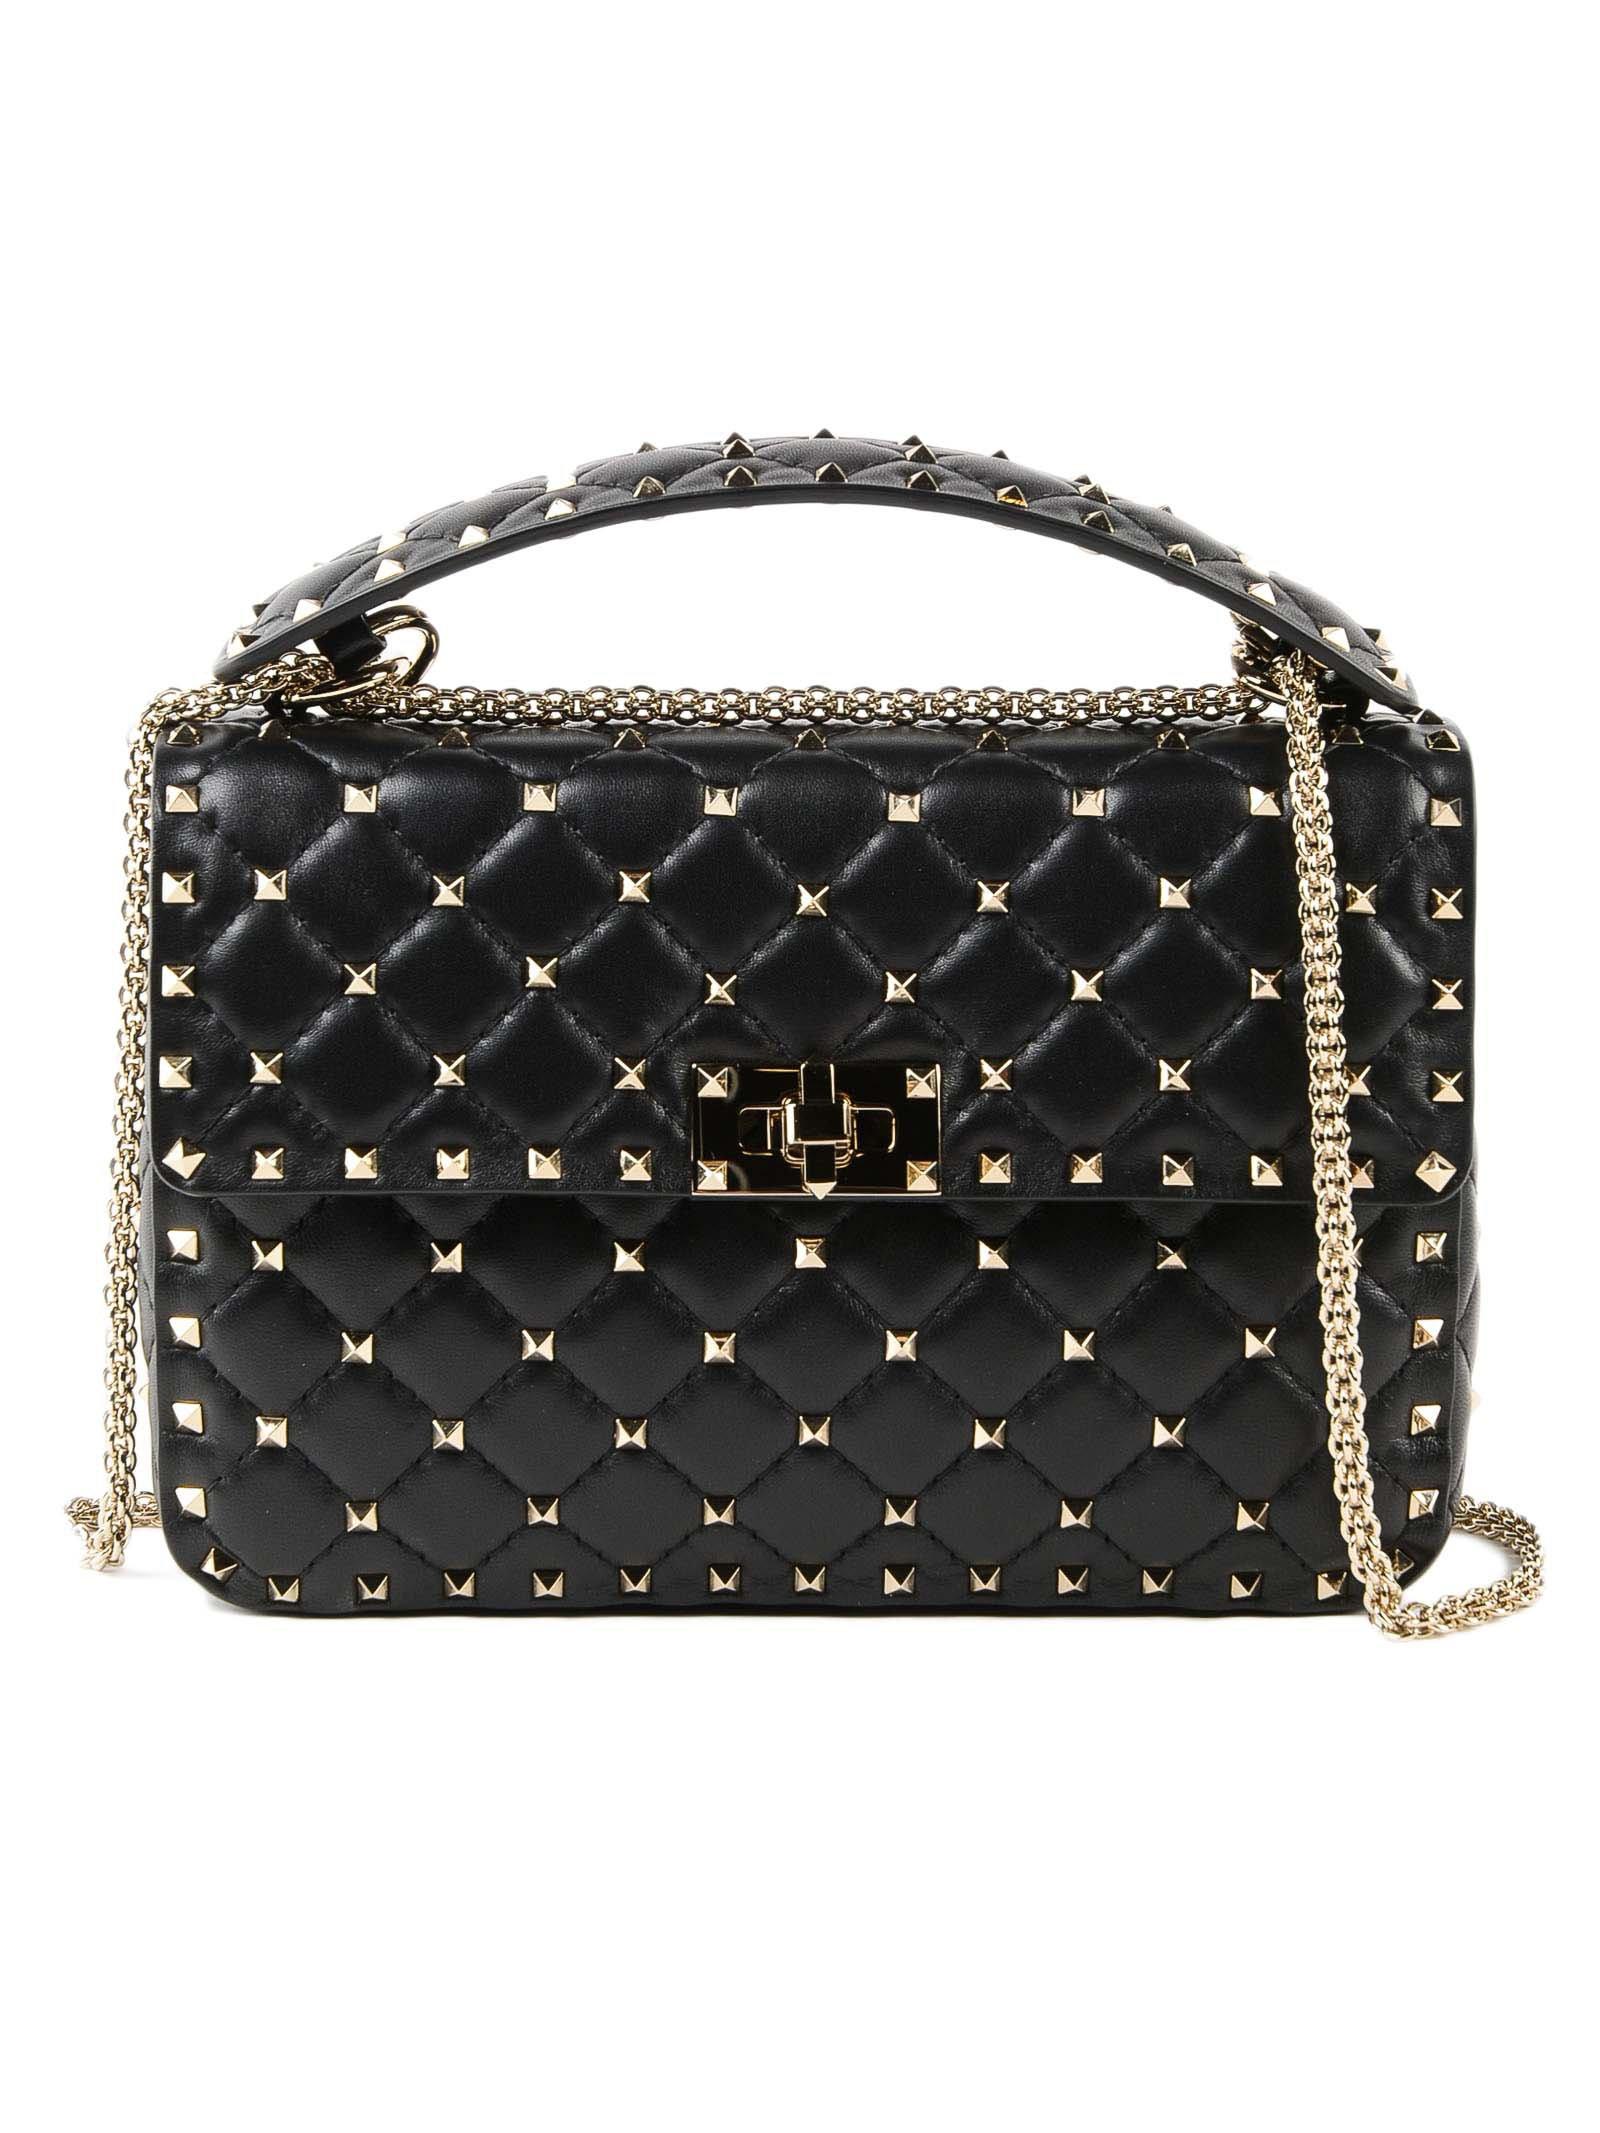 Valentino Garavani Rockstud Spike Medium Shoulder Bag